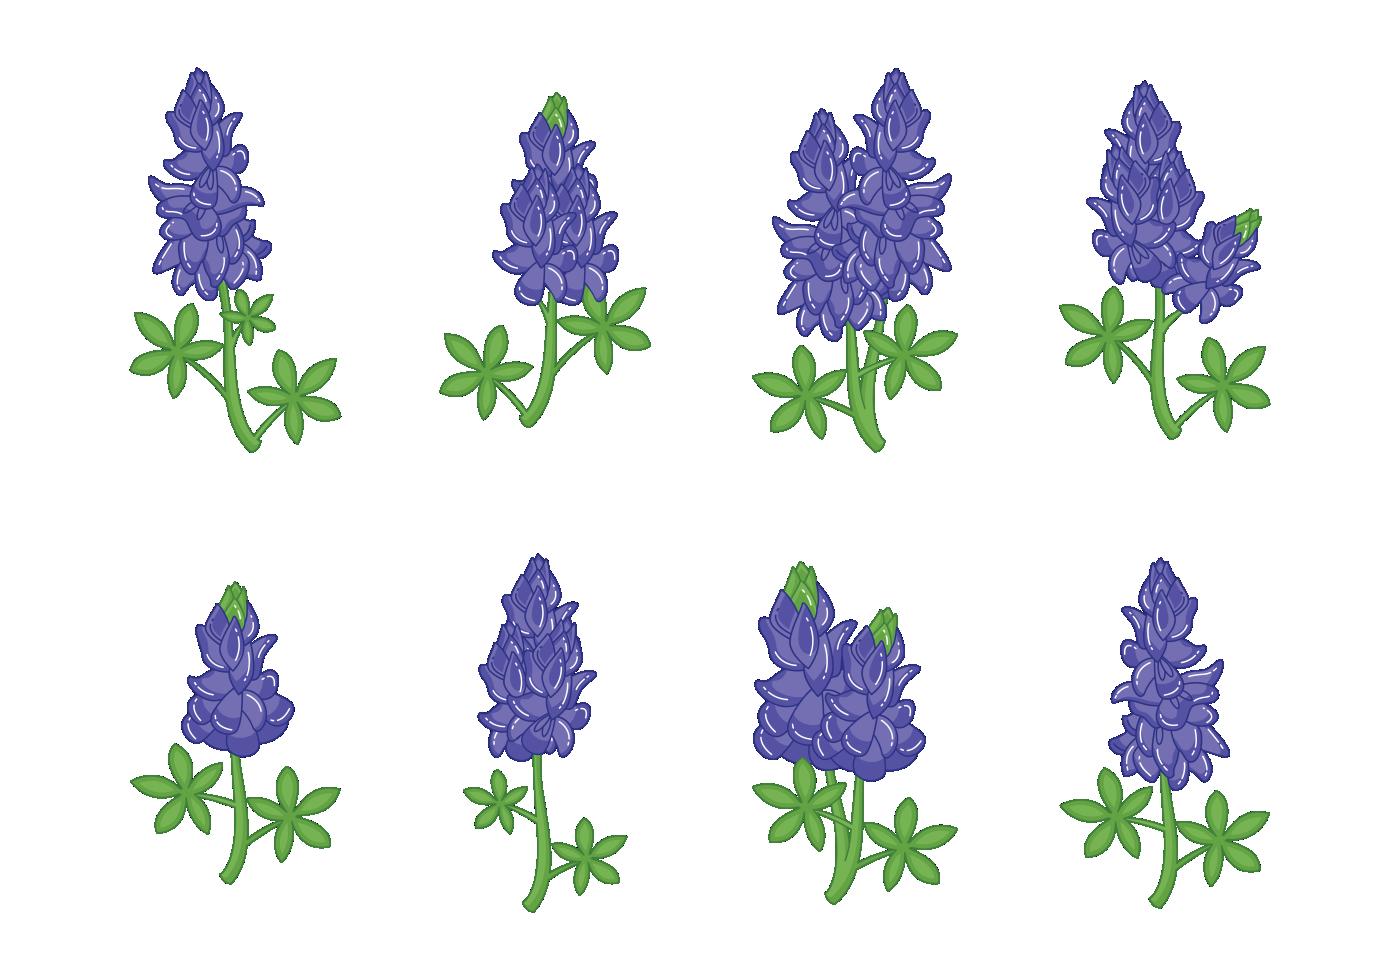 bluebonnet flower vectors download free vector art stock